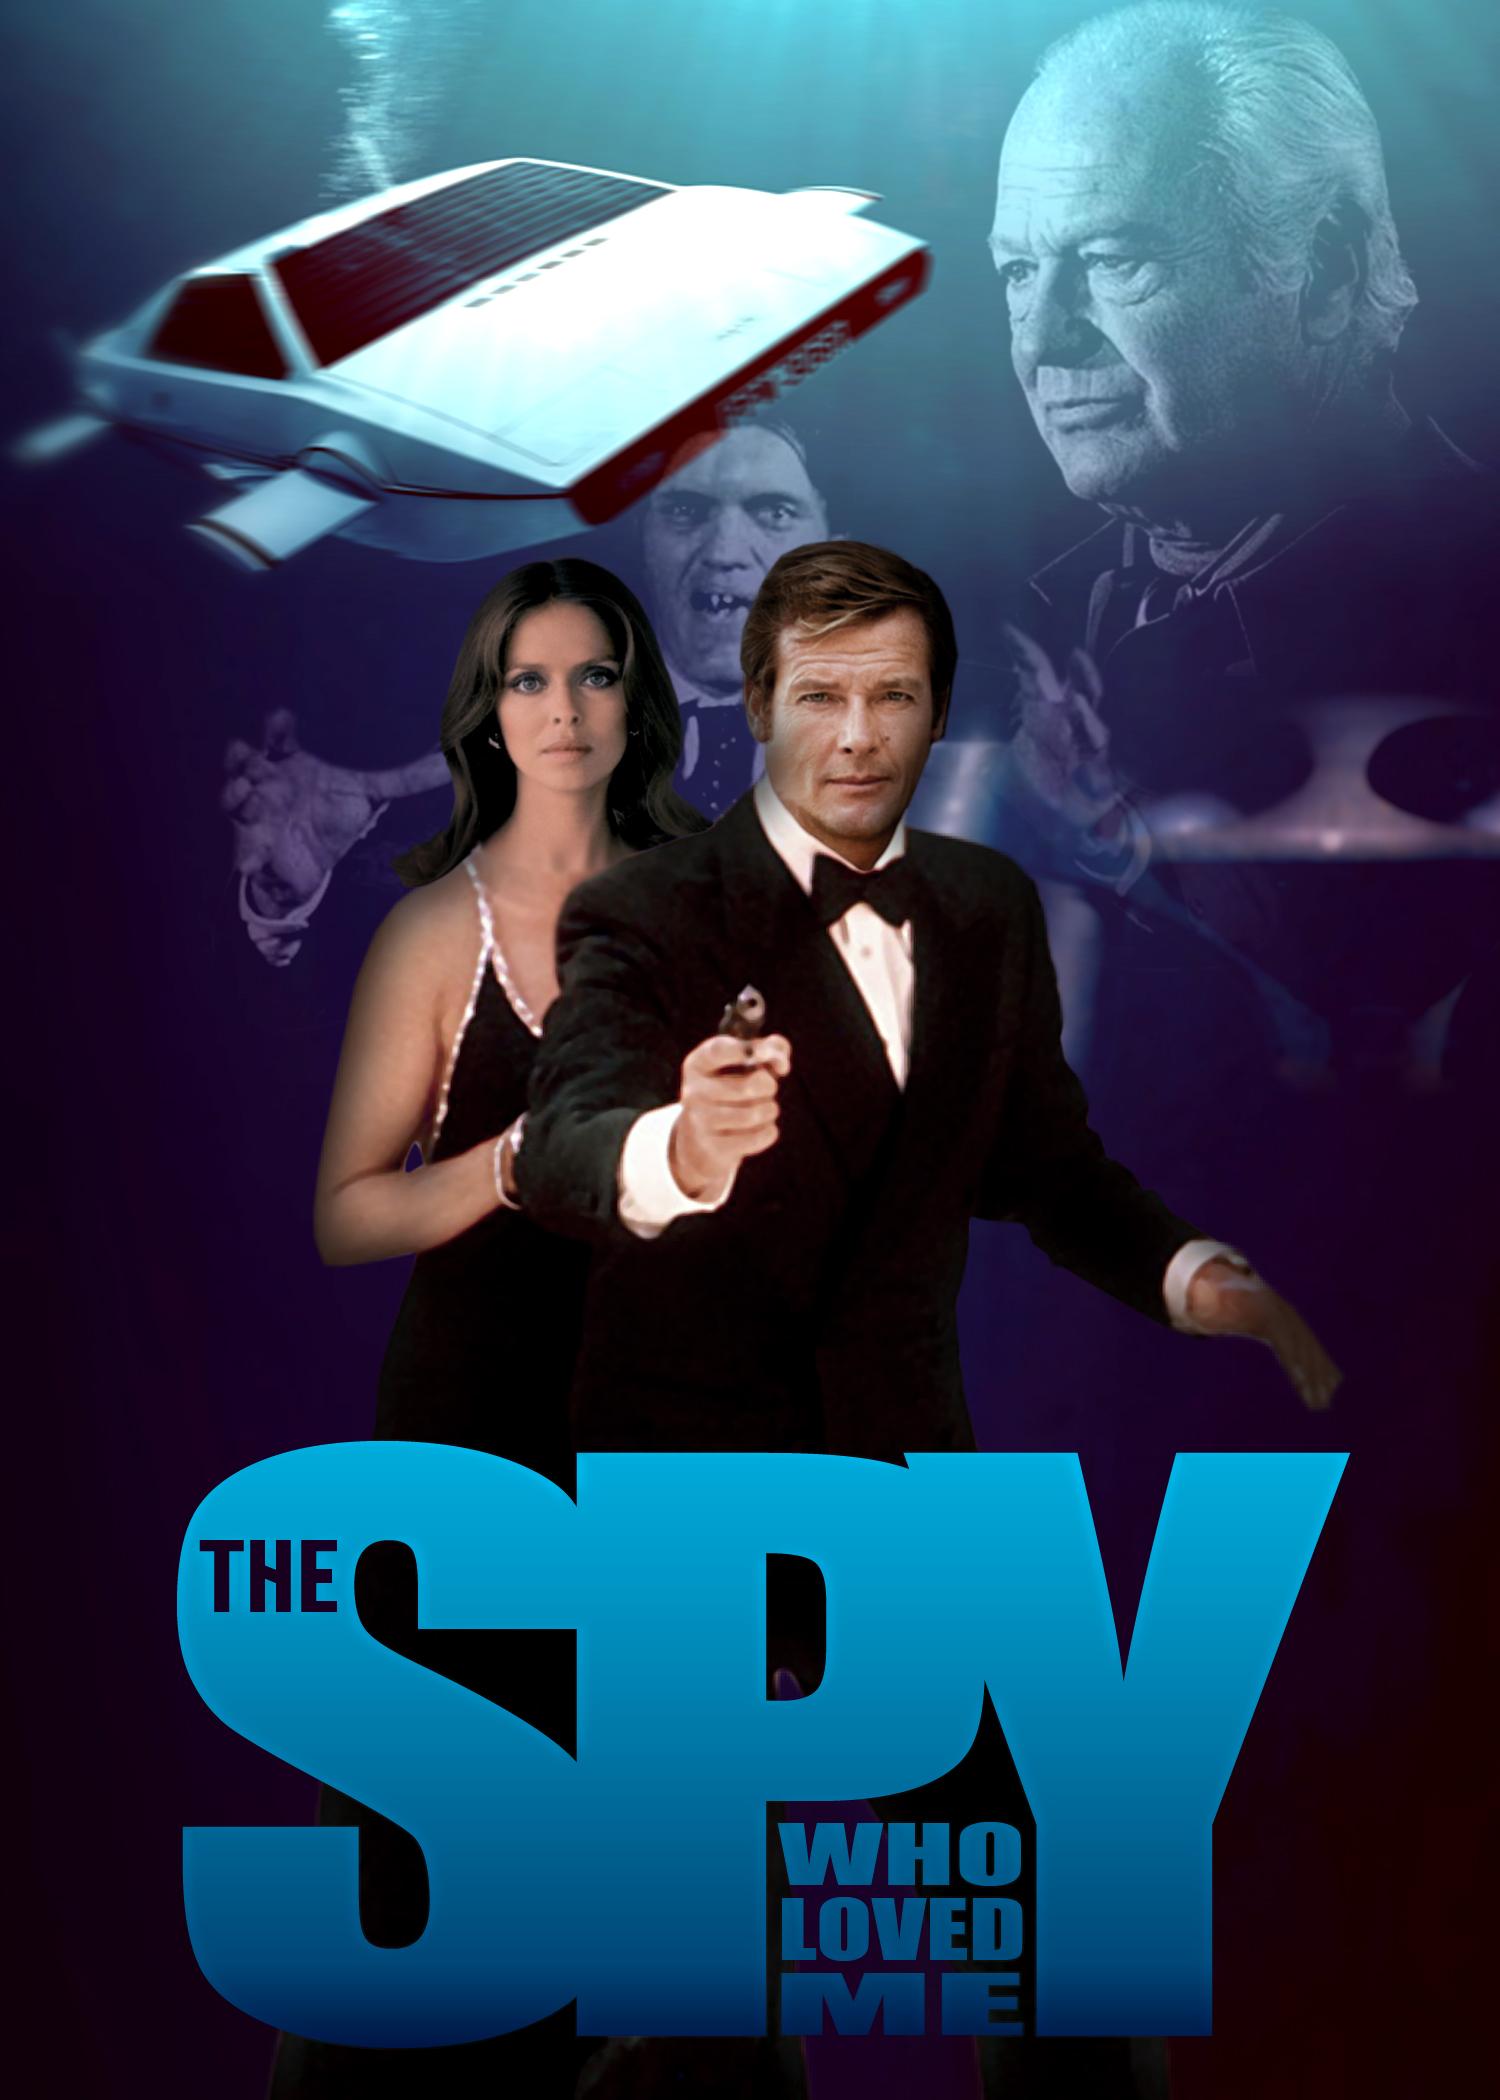 the_spy_who_loved_me_poster_by_comandercool22-d67rbfn.jpg